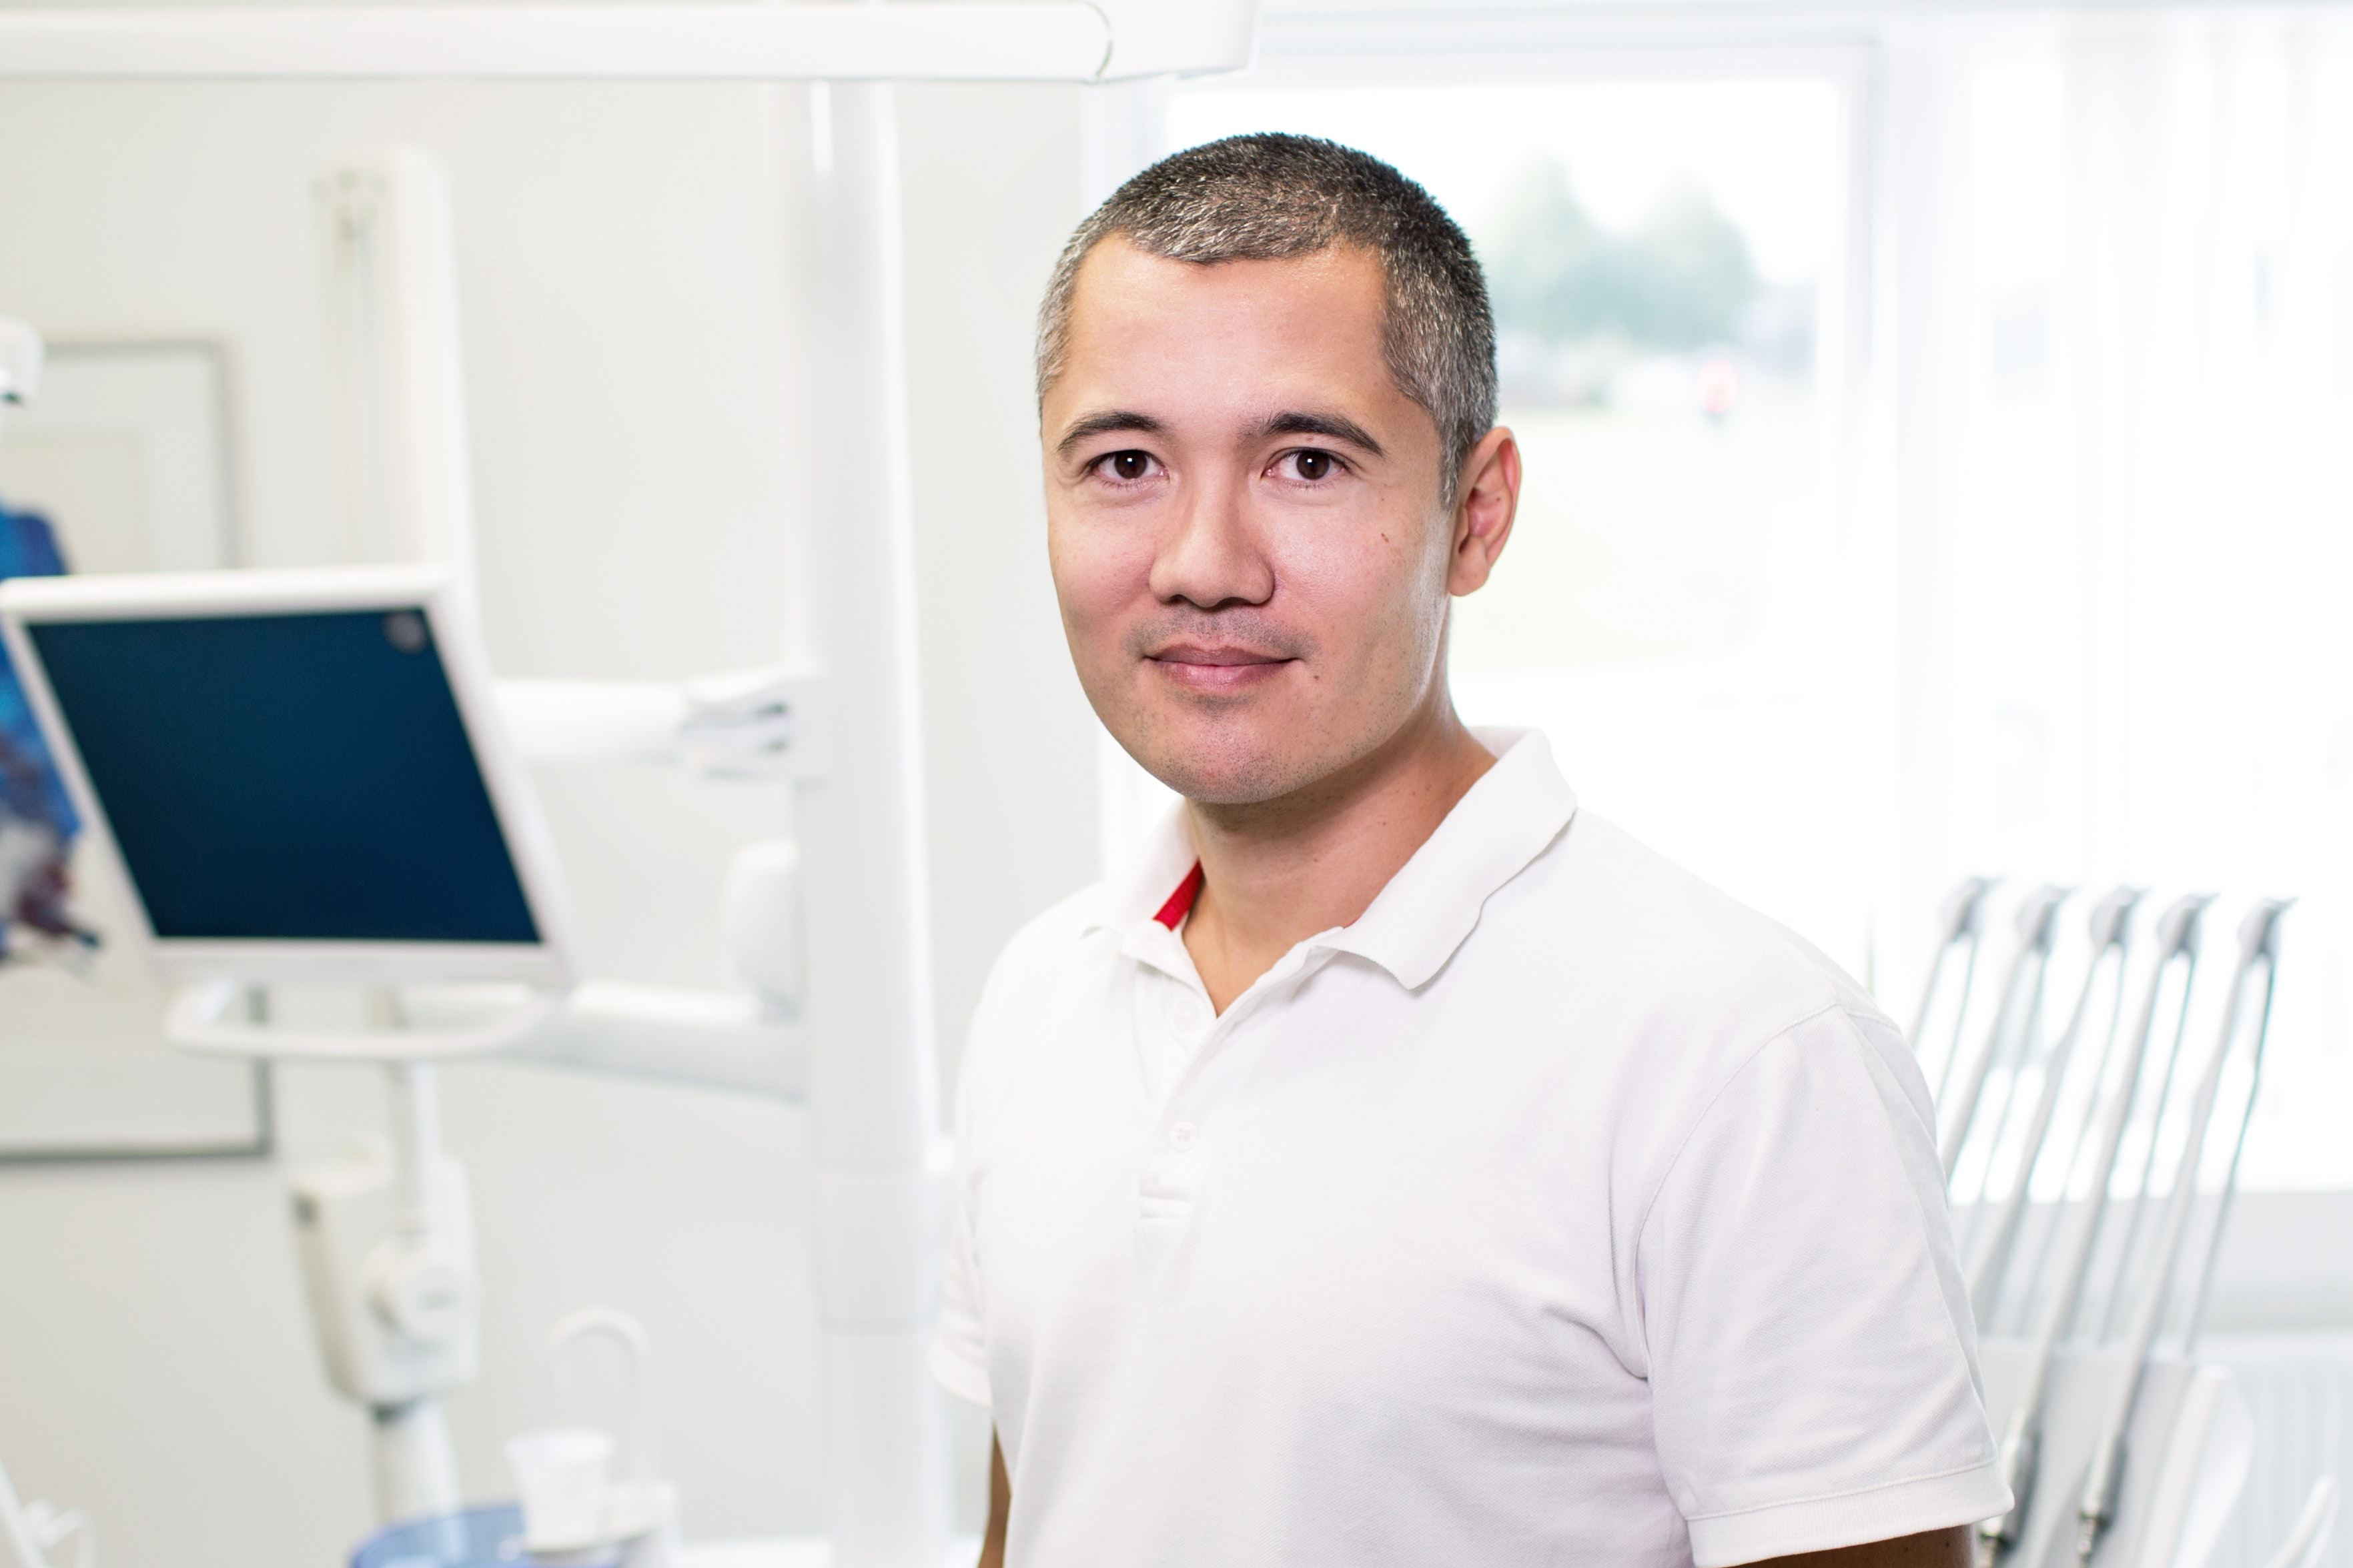 Portrait of smiling man photo